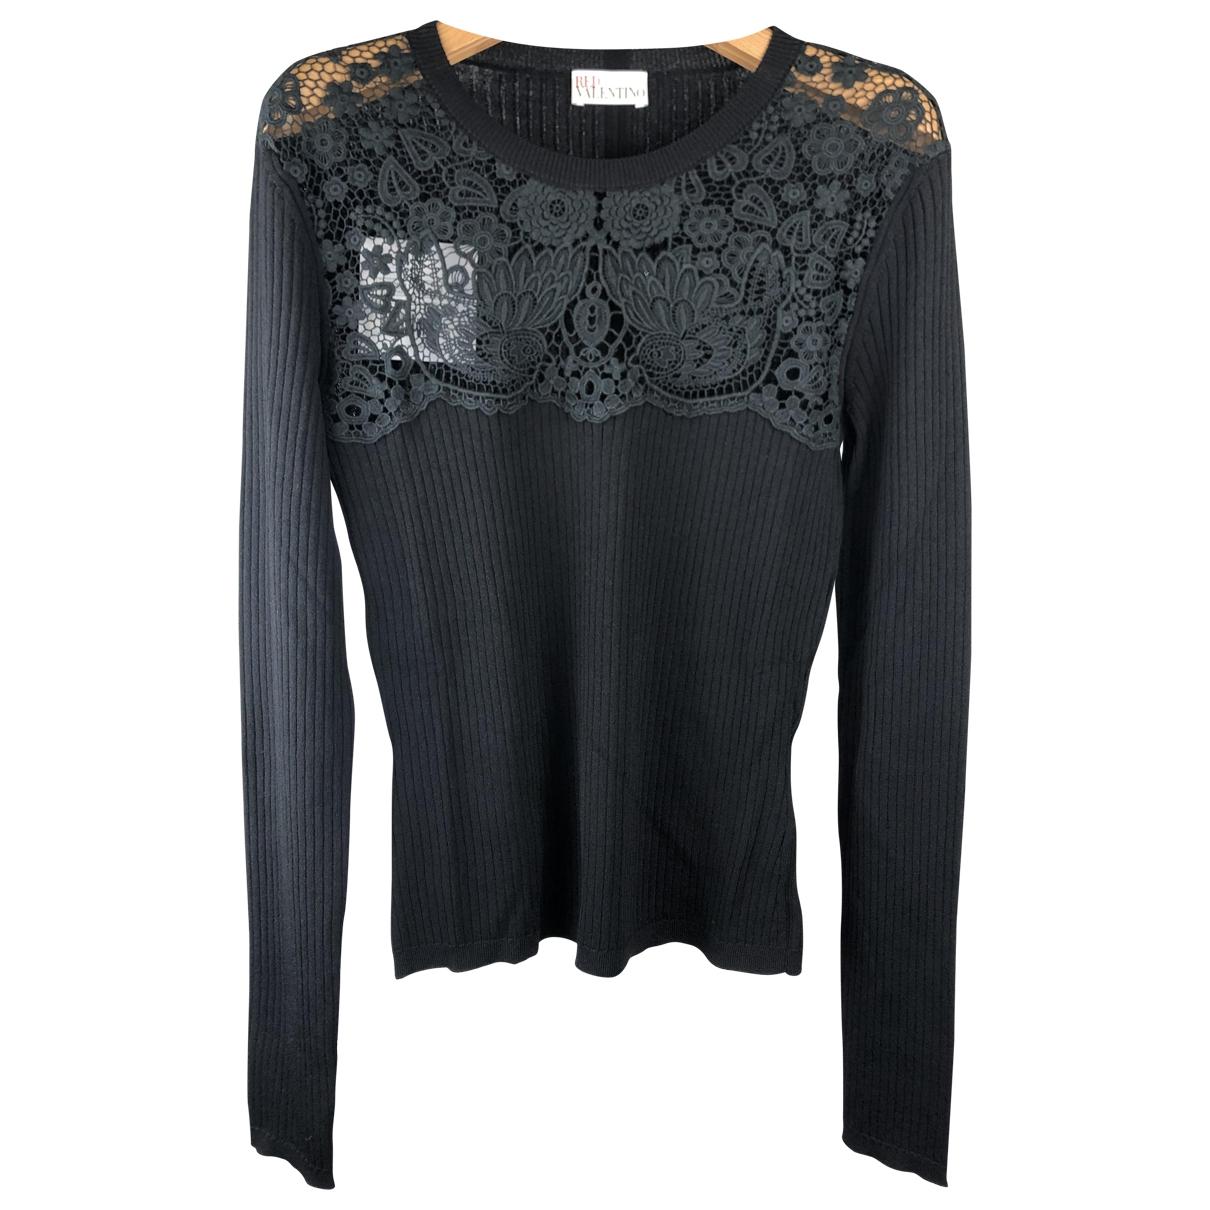 Red Valentino Garavani \N Black Knitwear for Women XL International